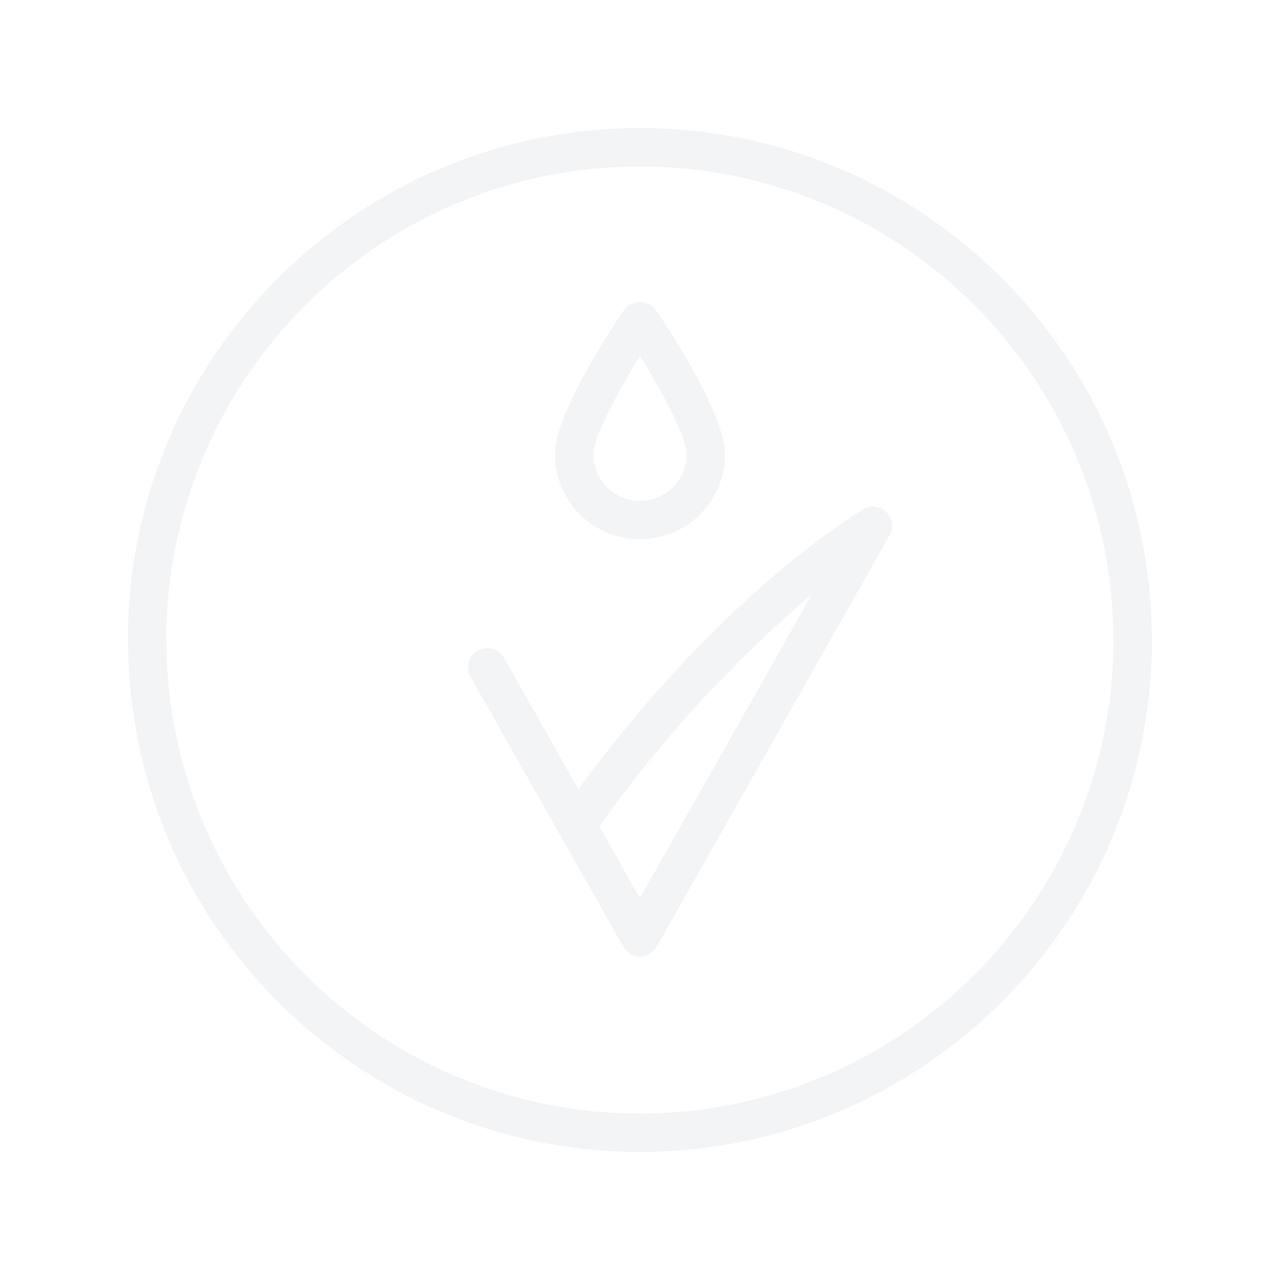 ELIZABETH ARDEN Sheer Kiss Lip Oil 7ml